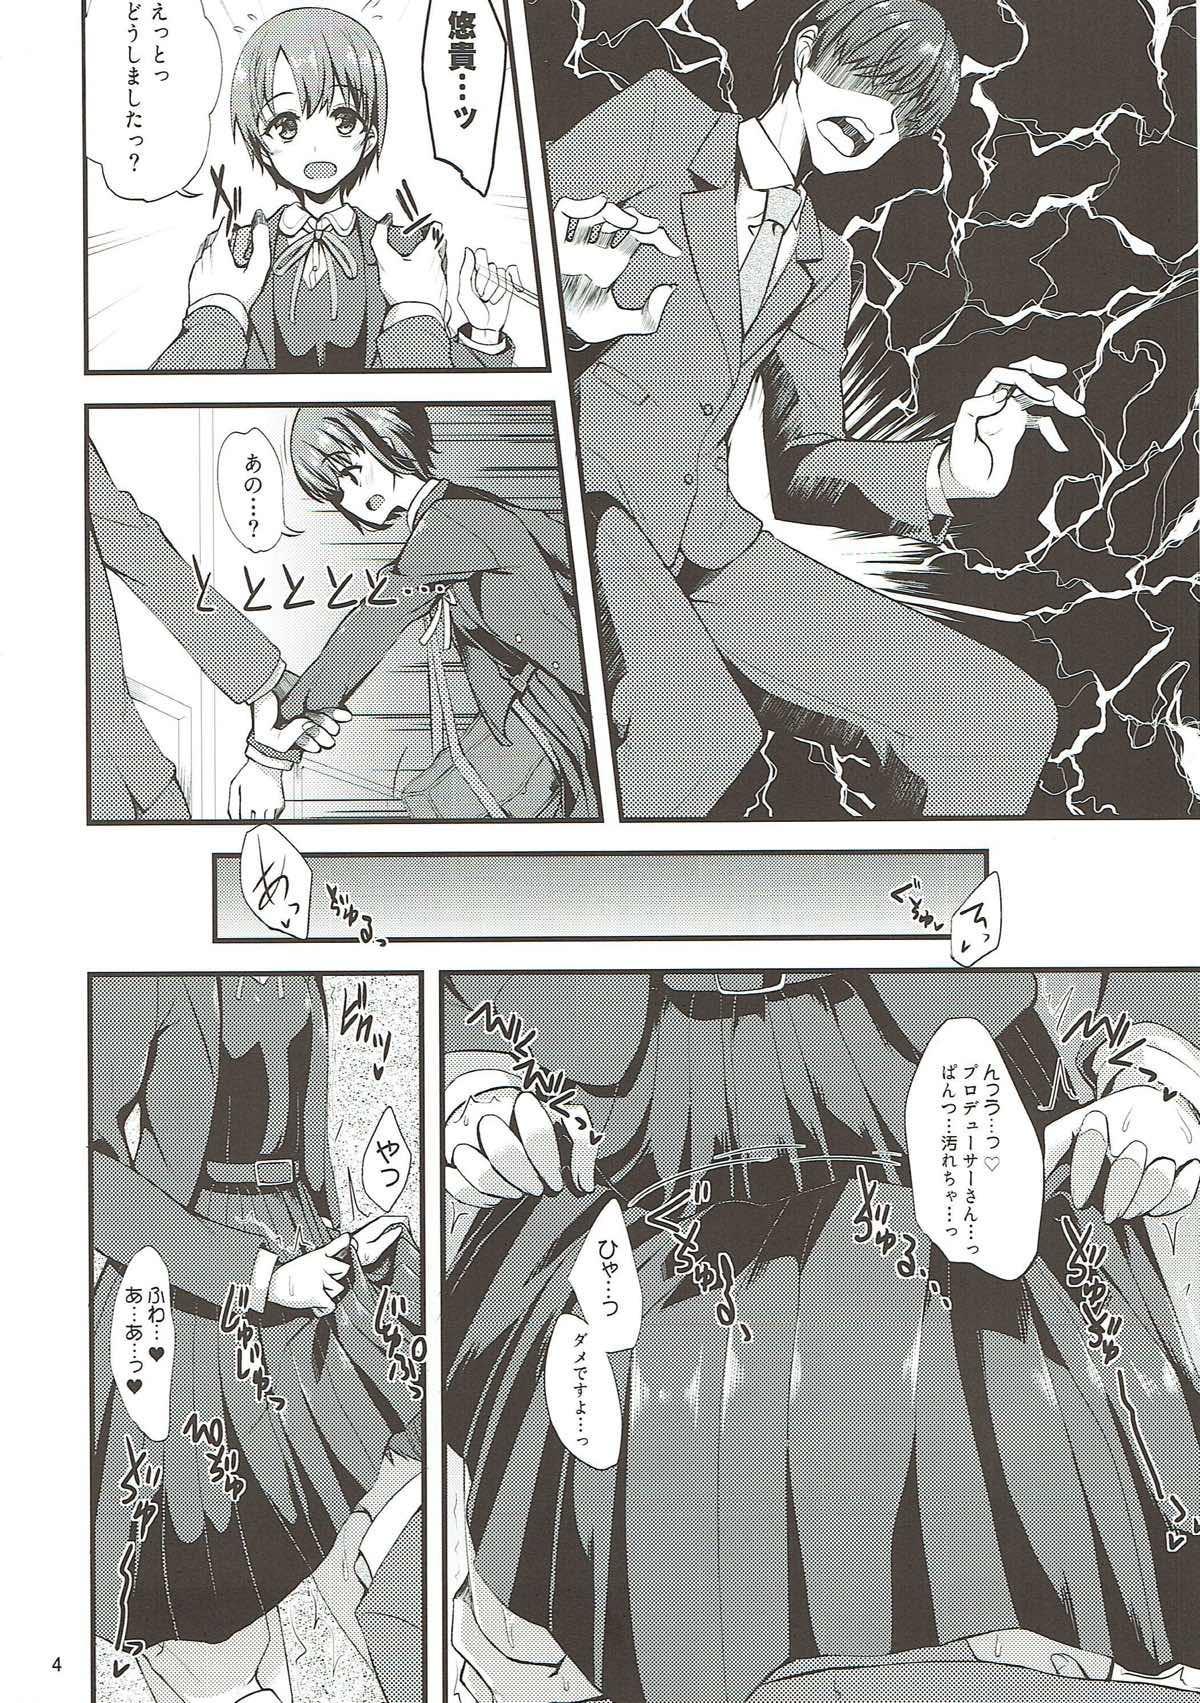 Idol ga Seifuku ni Kigaetara 2